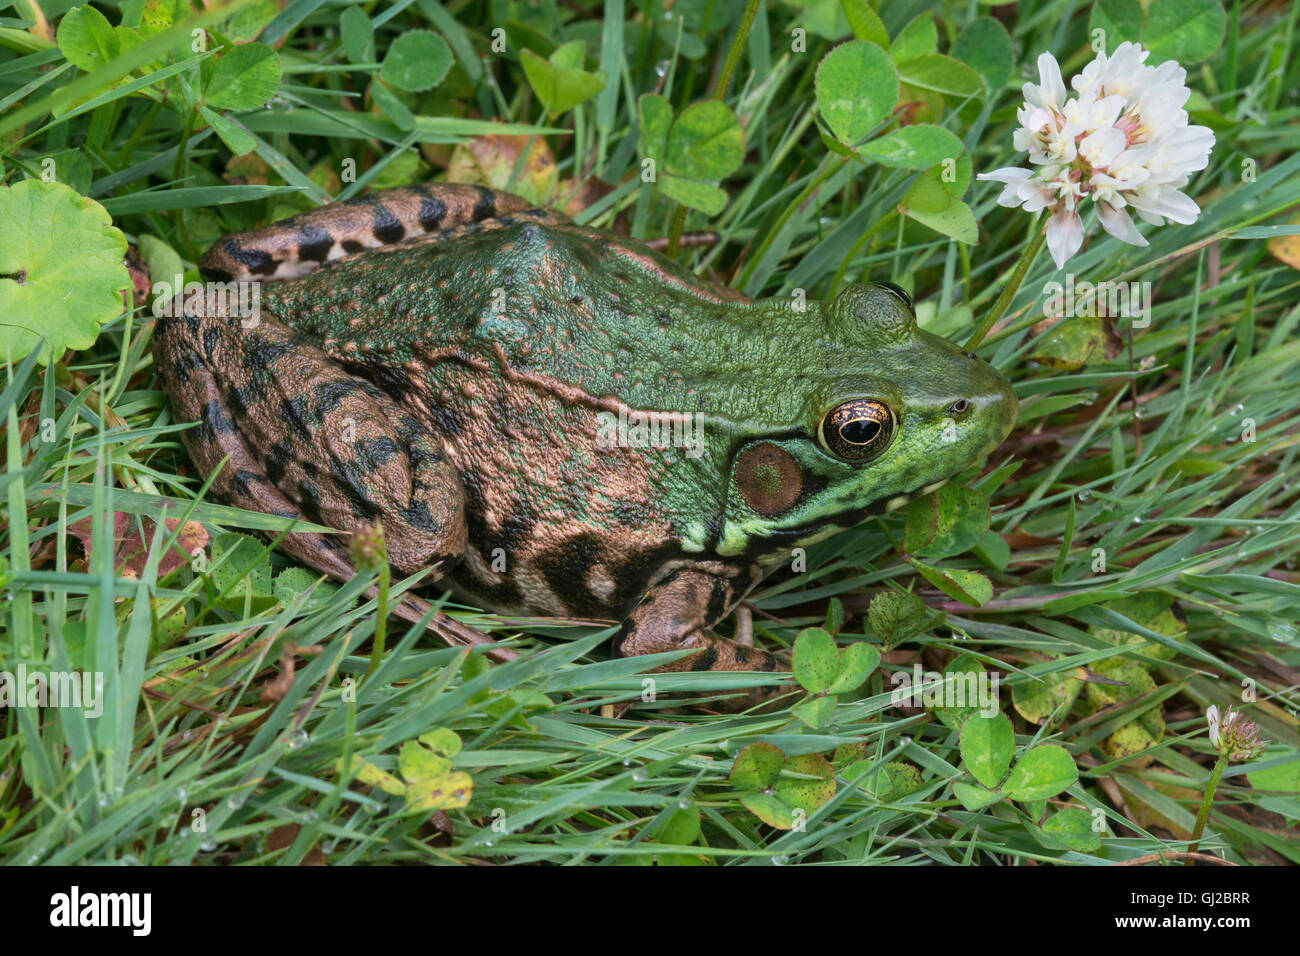 Rana Verde Rana clamitans descansando entre flores de trébol blanco (Trifolium repens) E EE.UU. Foto de stock